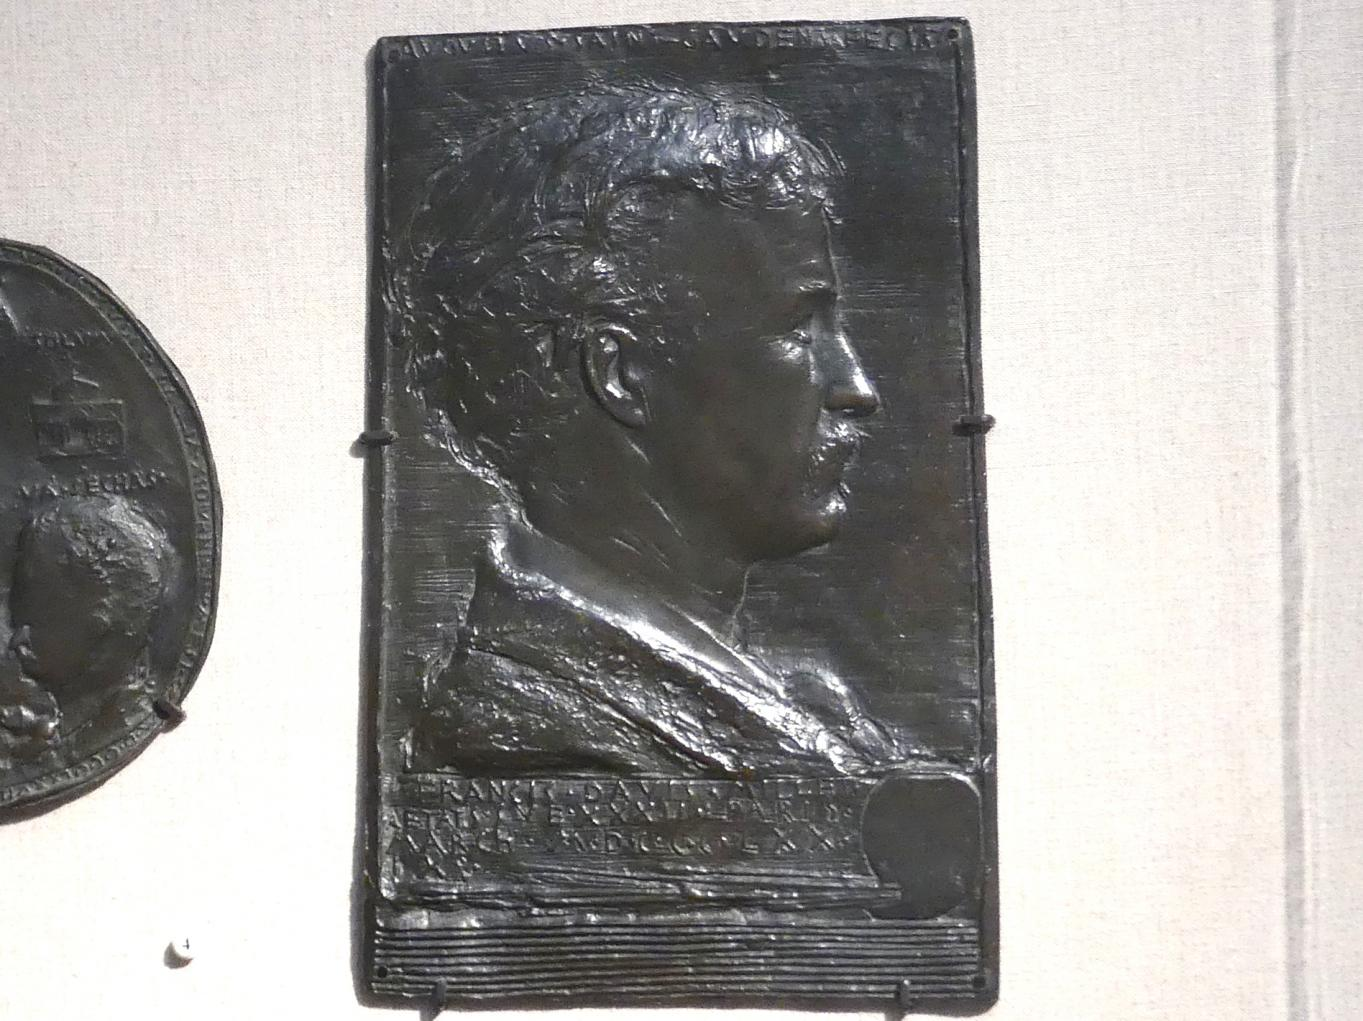 Augustus Saint-Gaudens: Francis Davis Millet, 1879